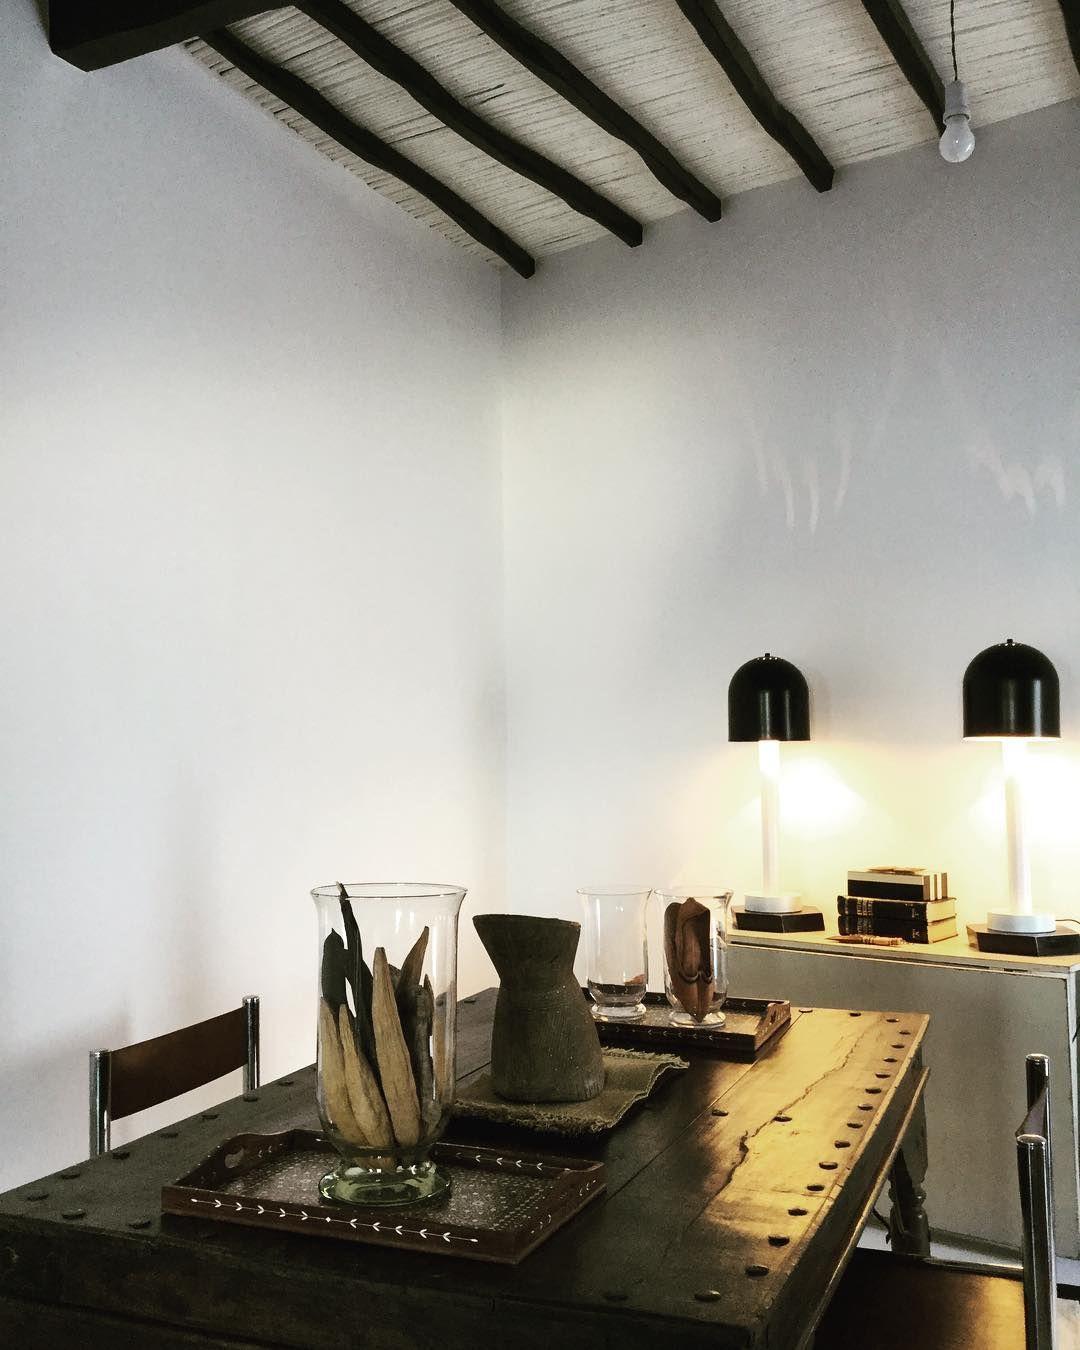 Home Design Smallhouse: Welcome To #malenebirgers_world # Smallhouse #greece